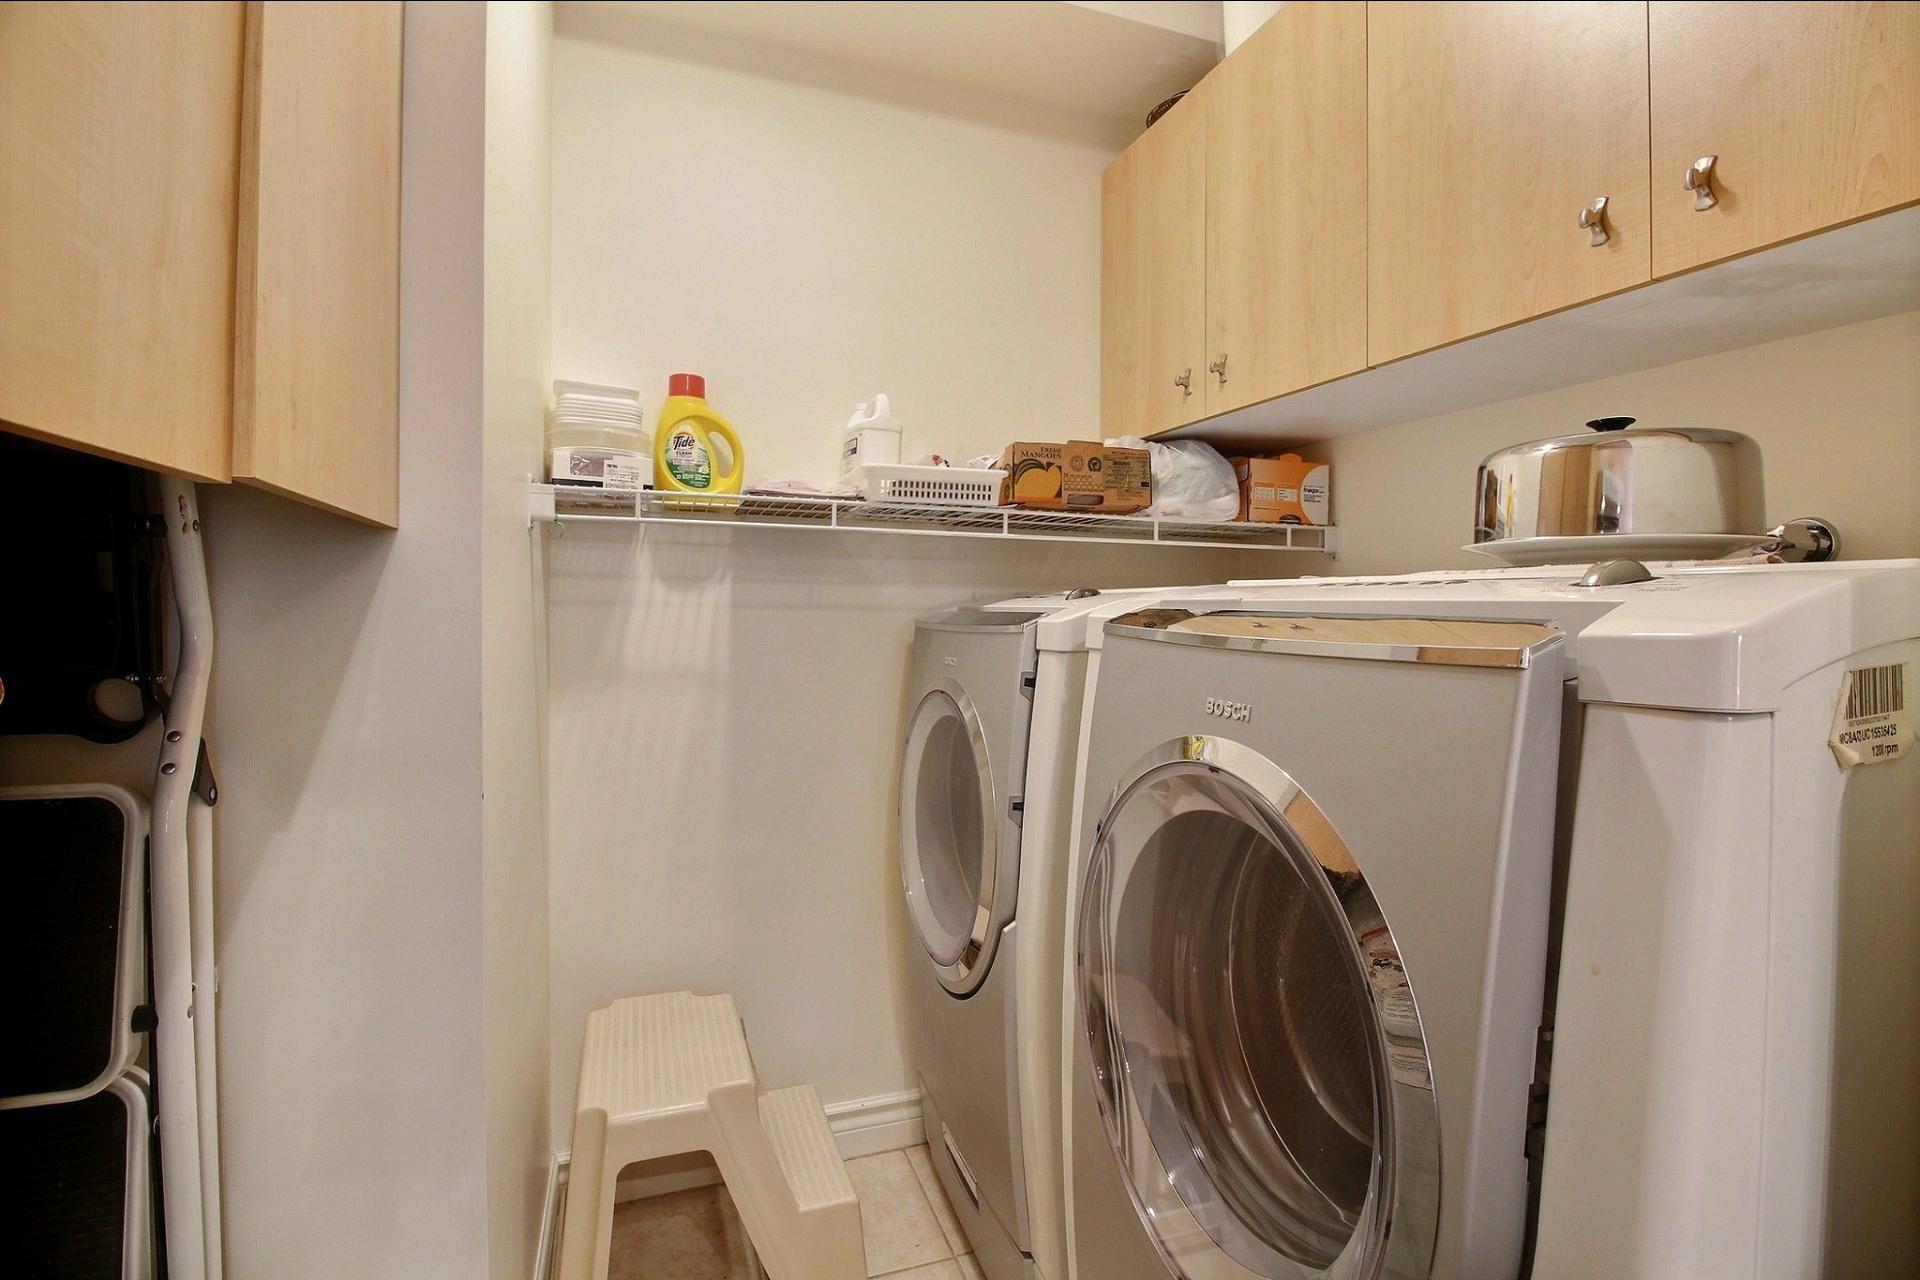 image 8 - Appartement À vendre Repentigny Repentigny  - 5 pièces